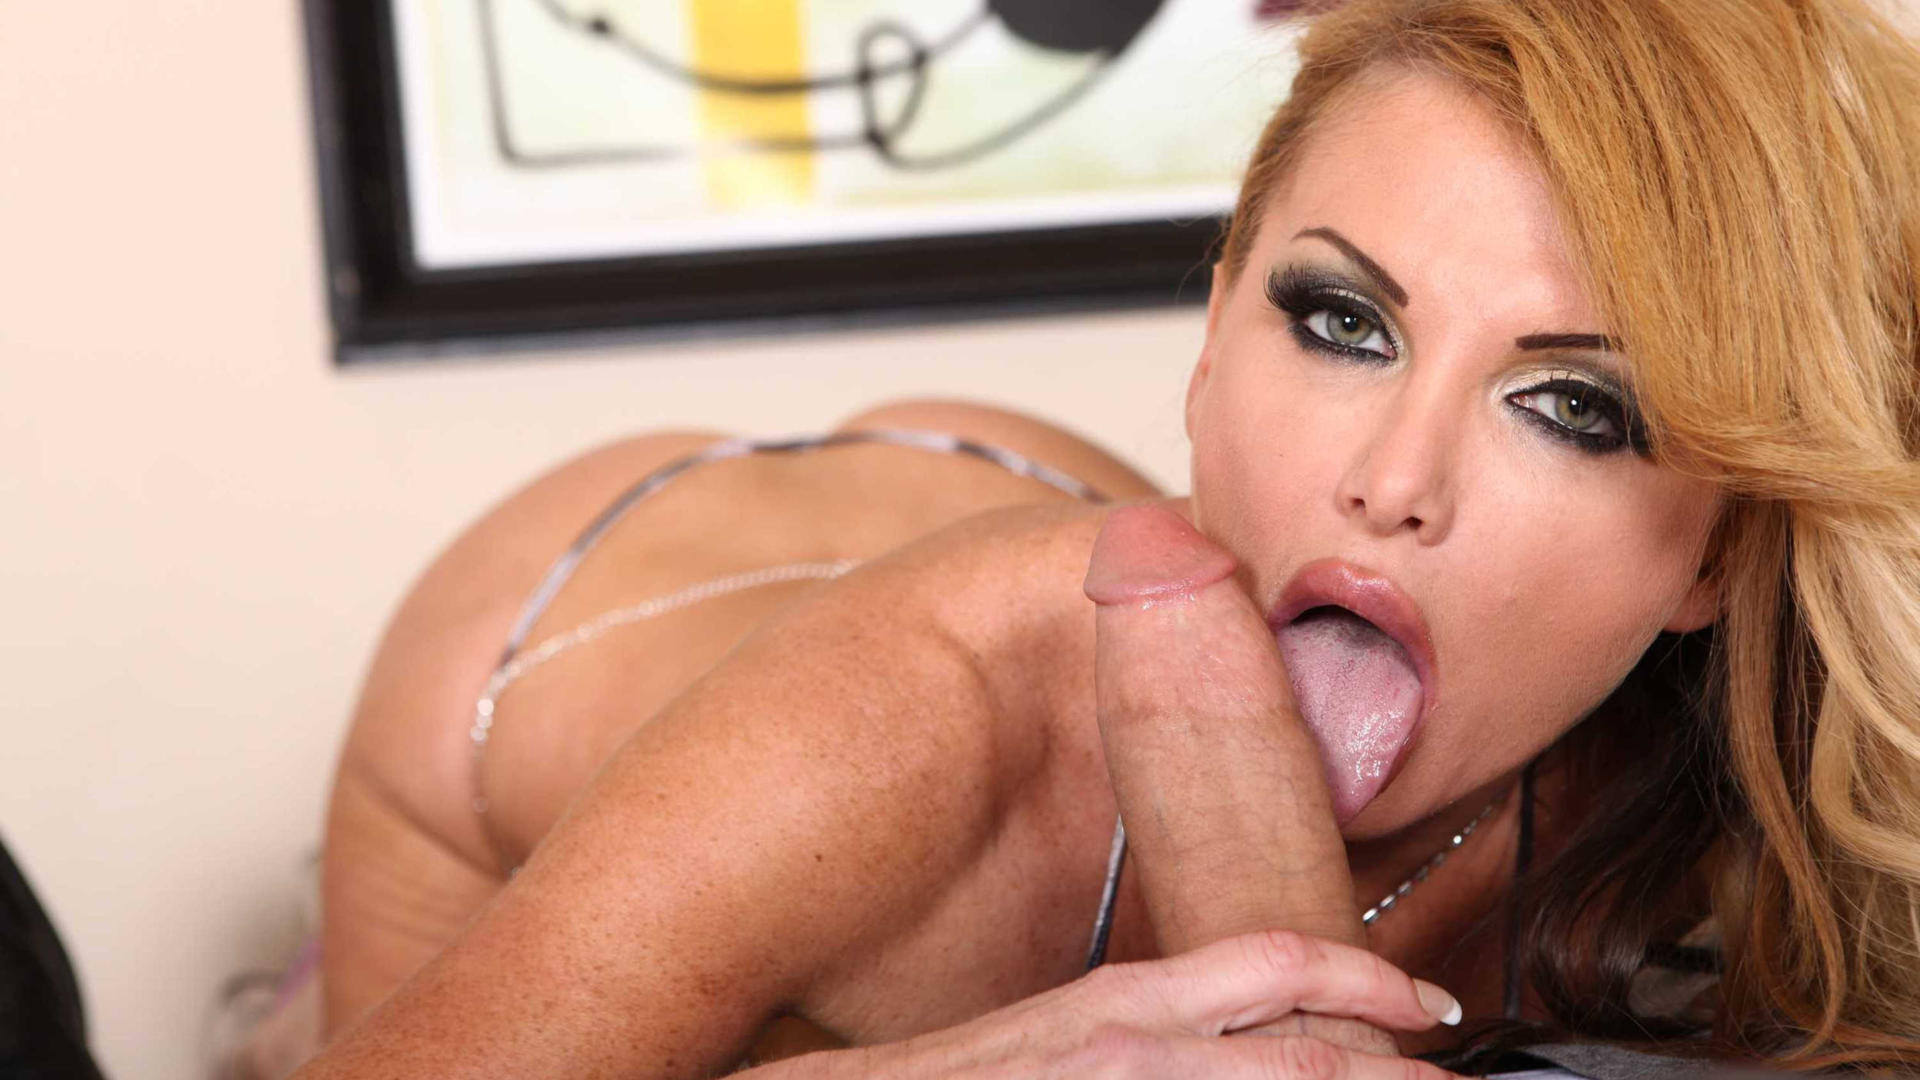 Big tits free pornfilms poland